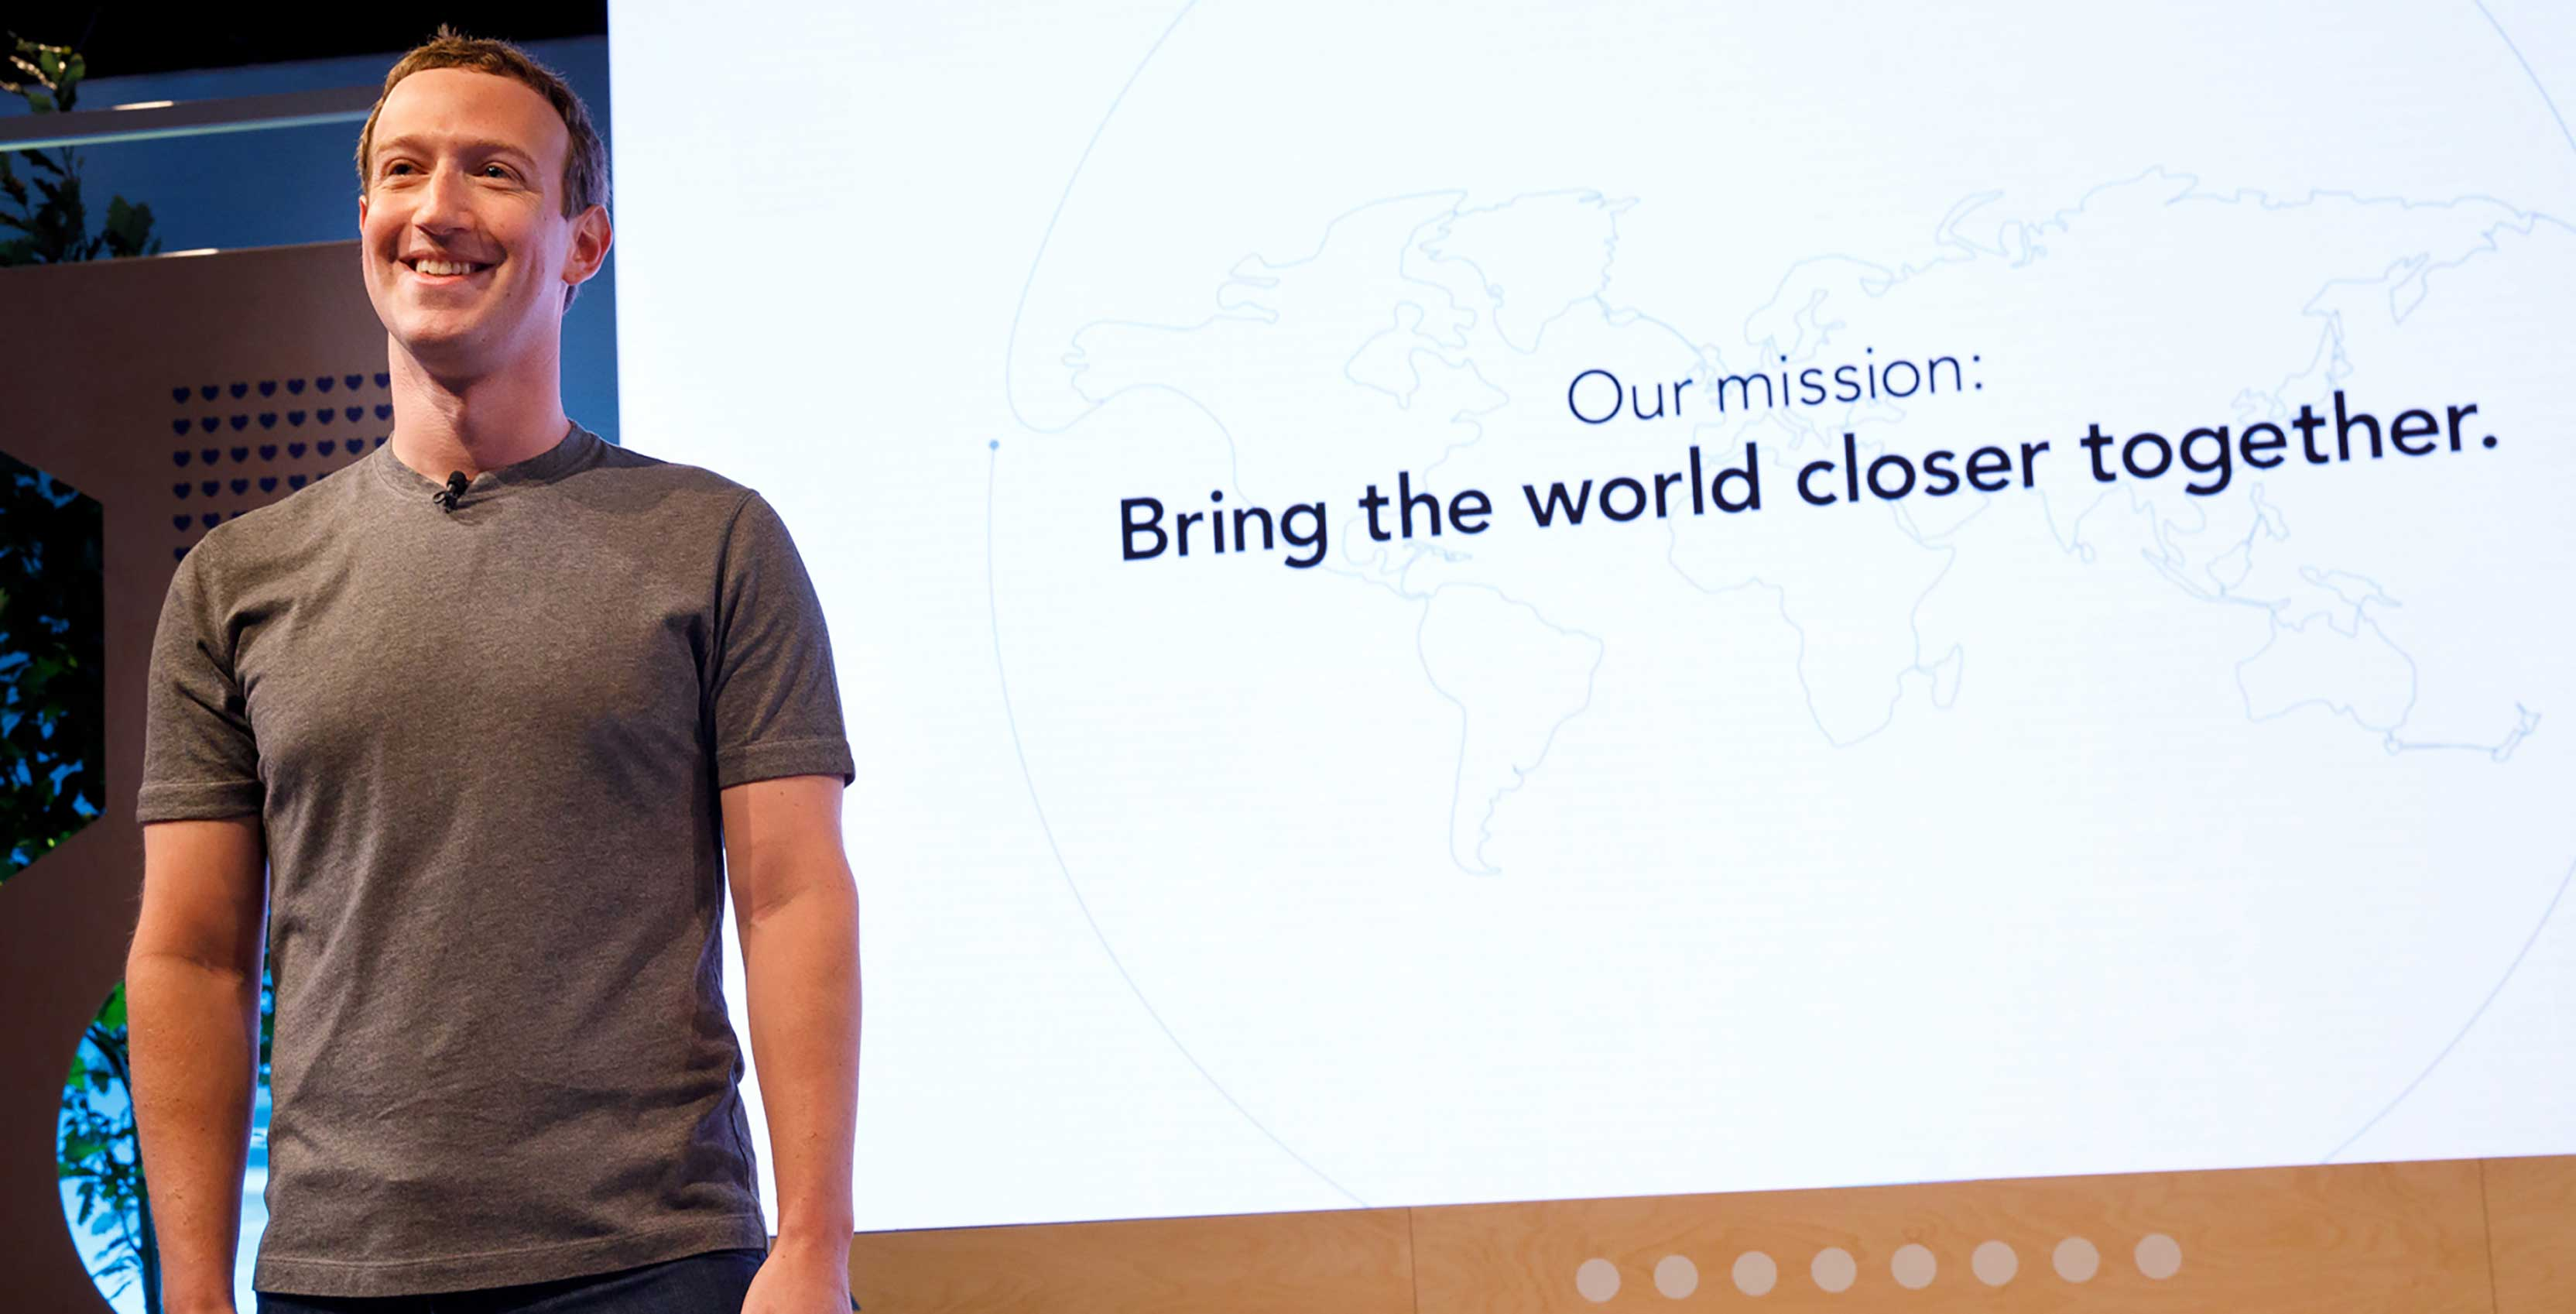 Facebook Mark Zuckerberg mission